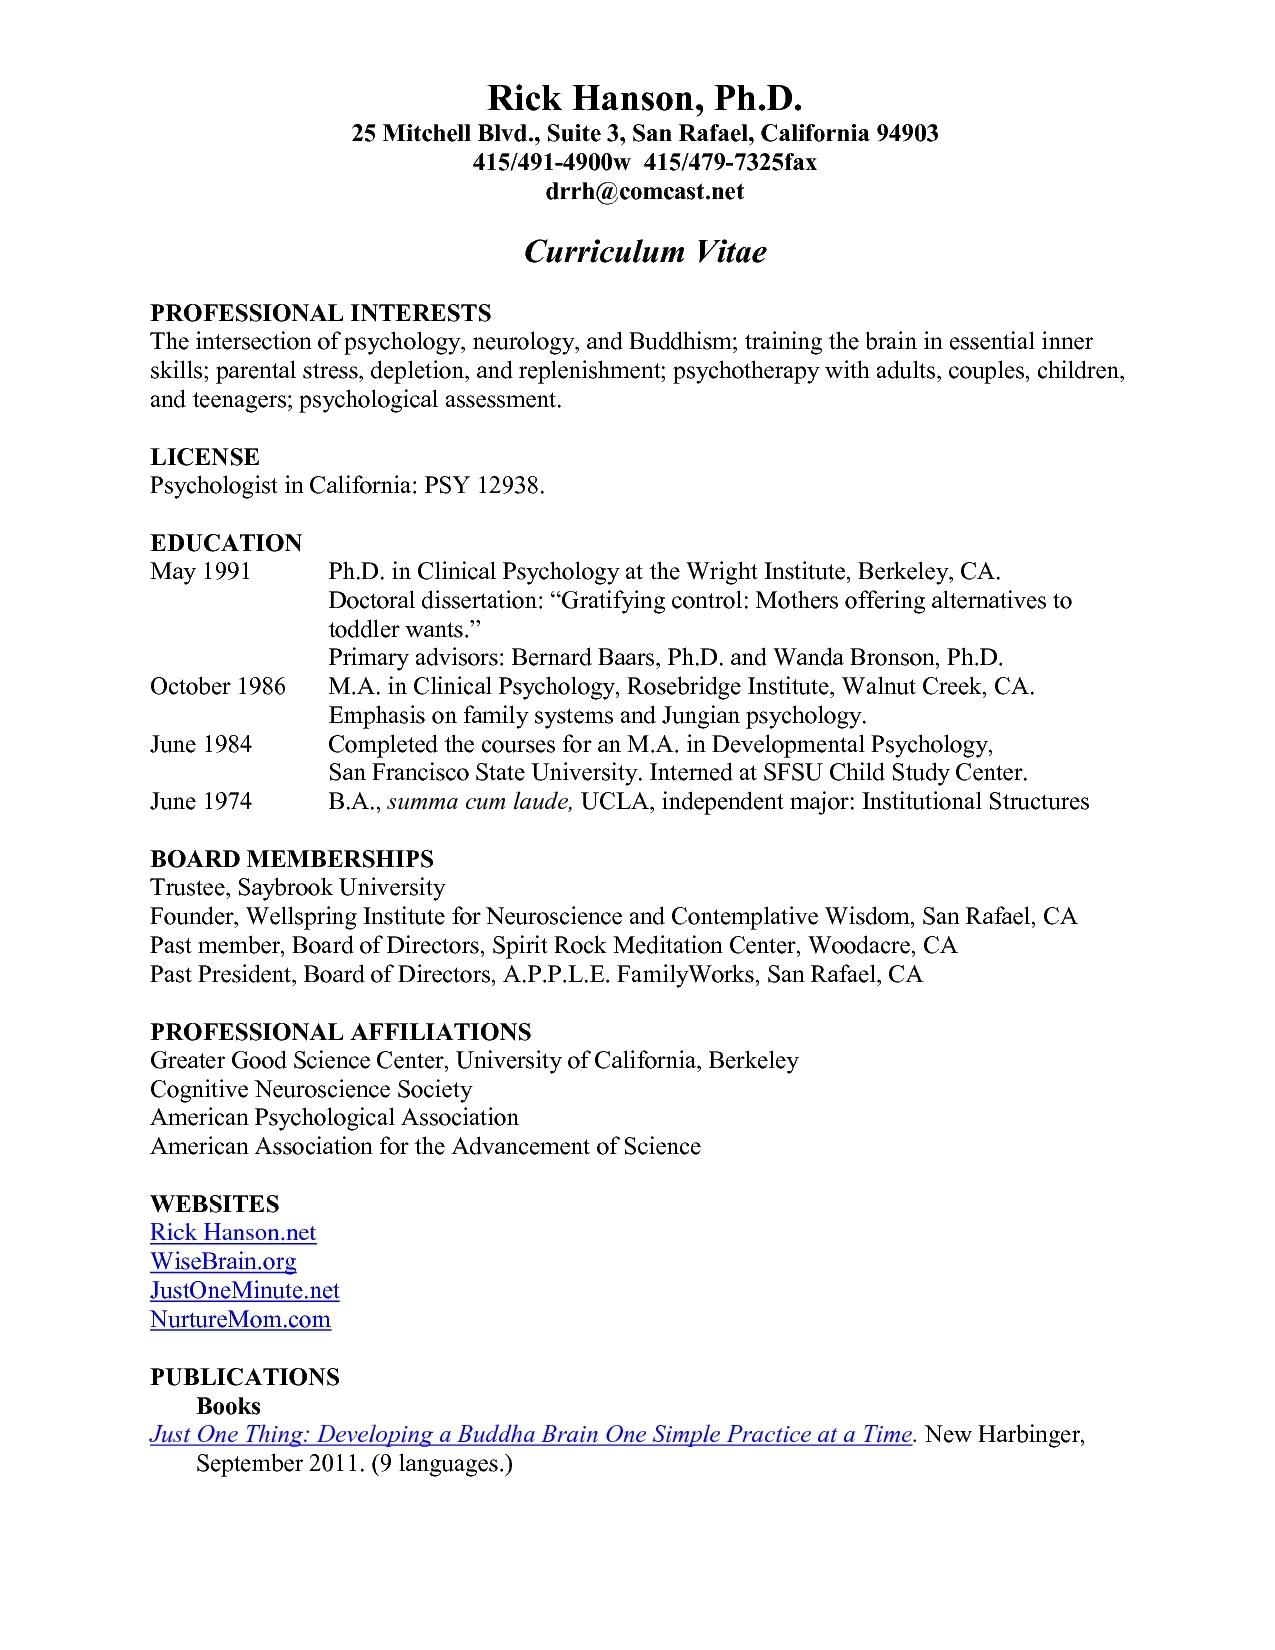 resume templates reddit